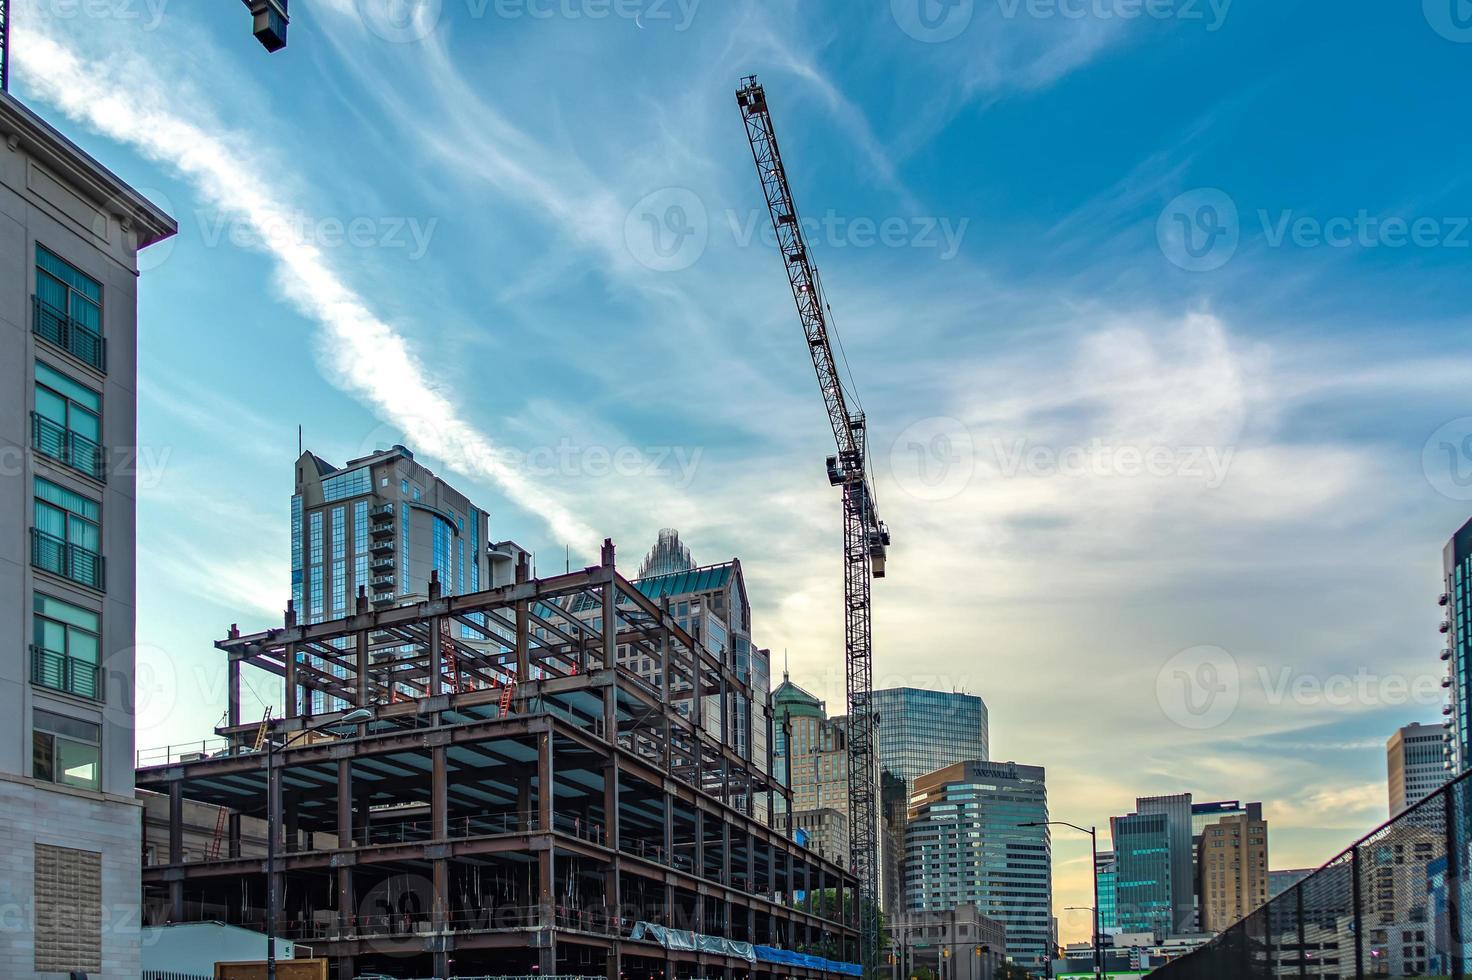 ville moderne en construction le matin photo